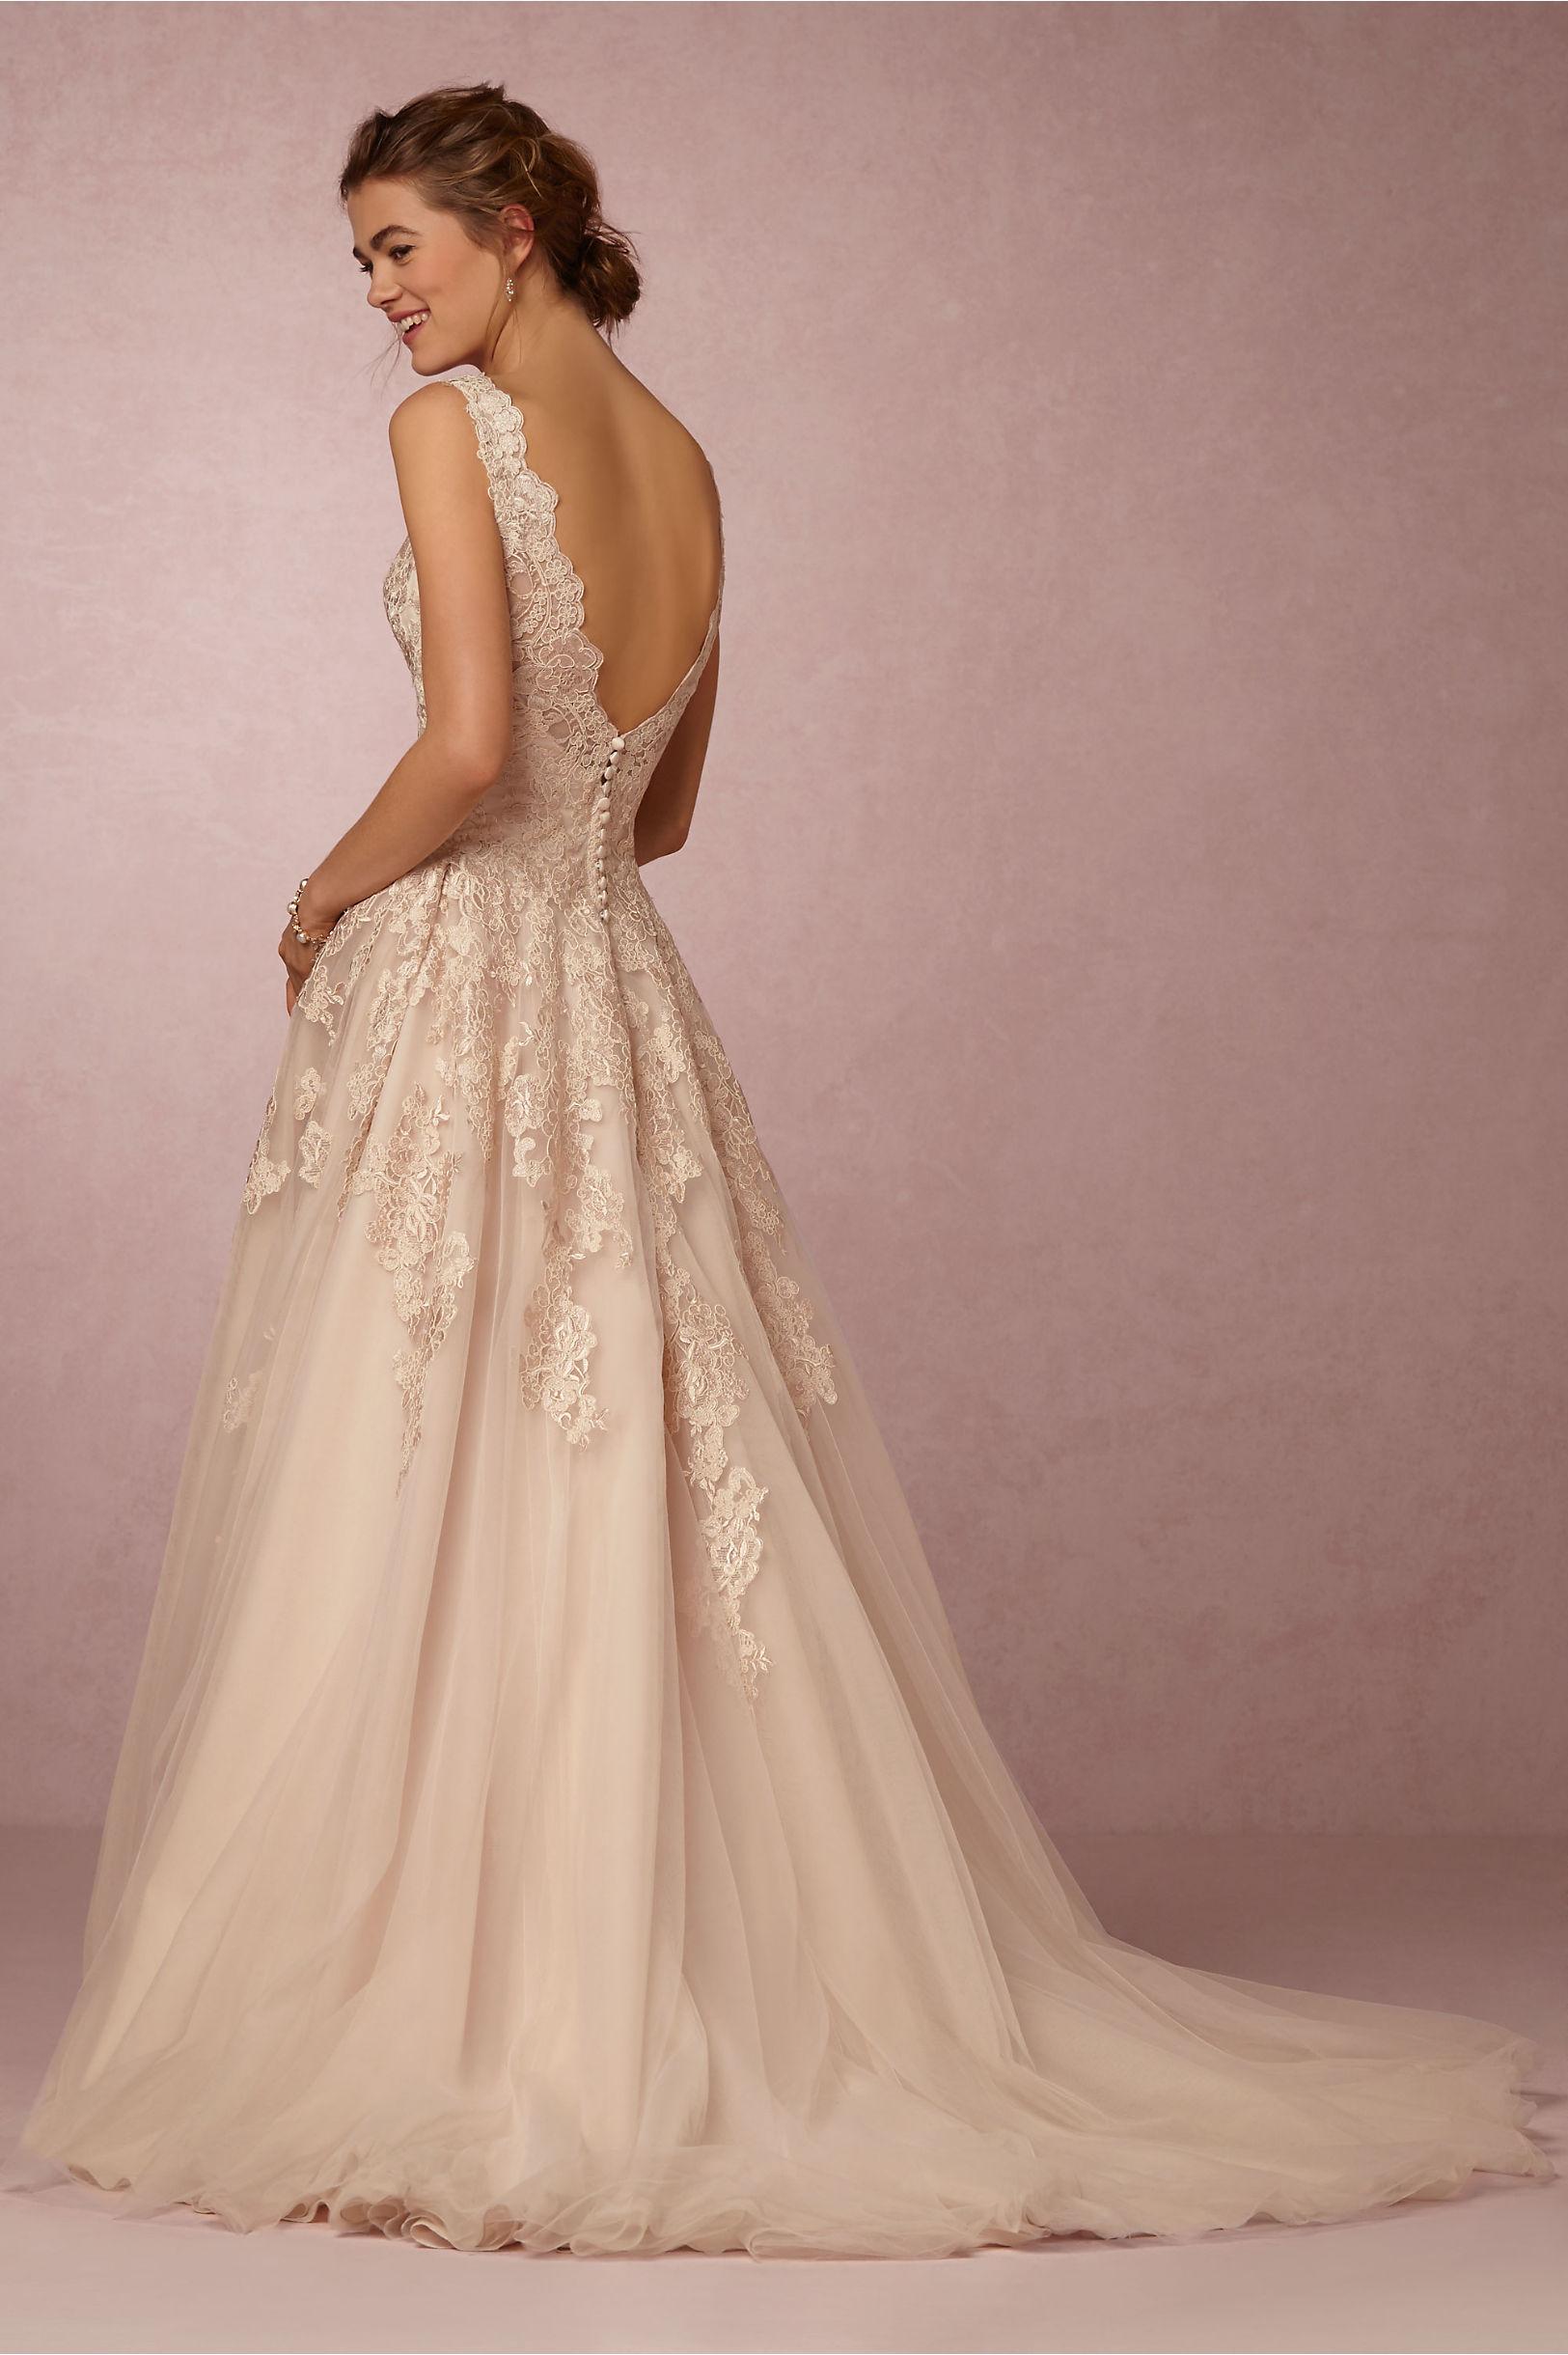 Stunning Wedding Dresses On Sale Wedding Dresses  Shop On Sale Wedding Gowns  Bhldn